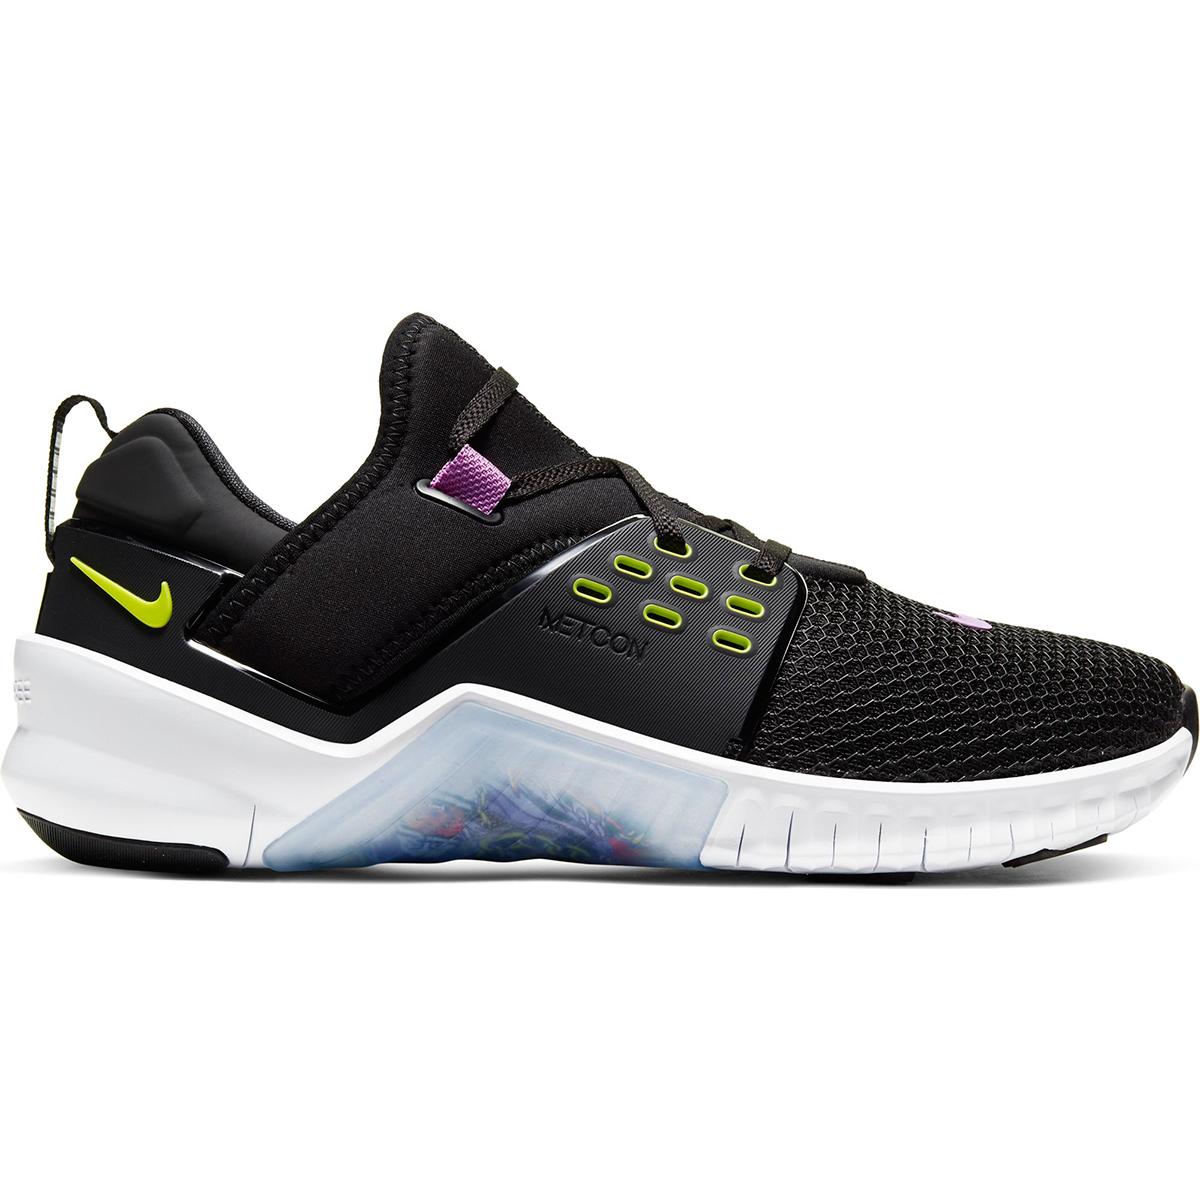 Men's Nike Free X Metcon 2 Training Shoes - Color: Black/Purple Nebula/White/Bright (Regular Width) - Size: 6, Black/Purple Nebula/White/Bright, large, image 1